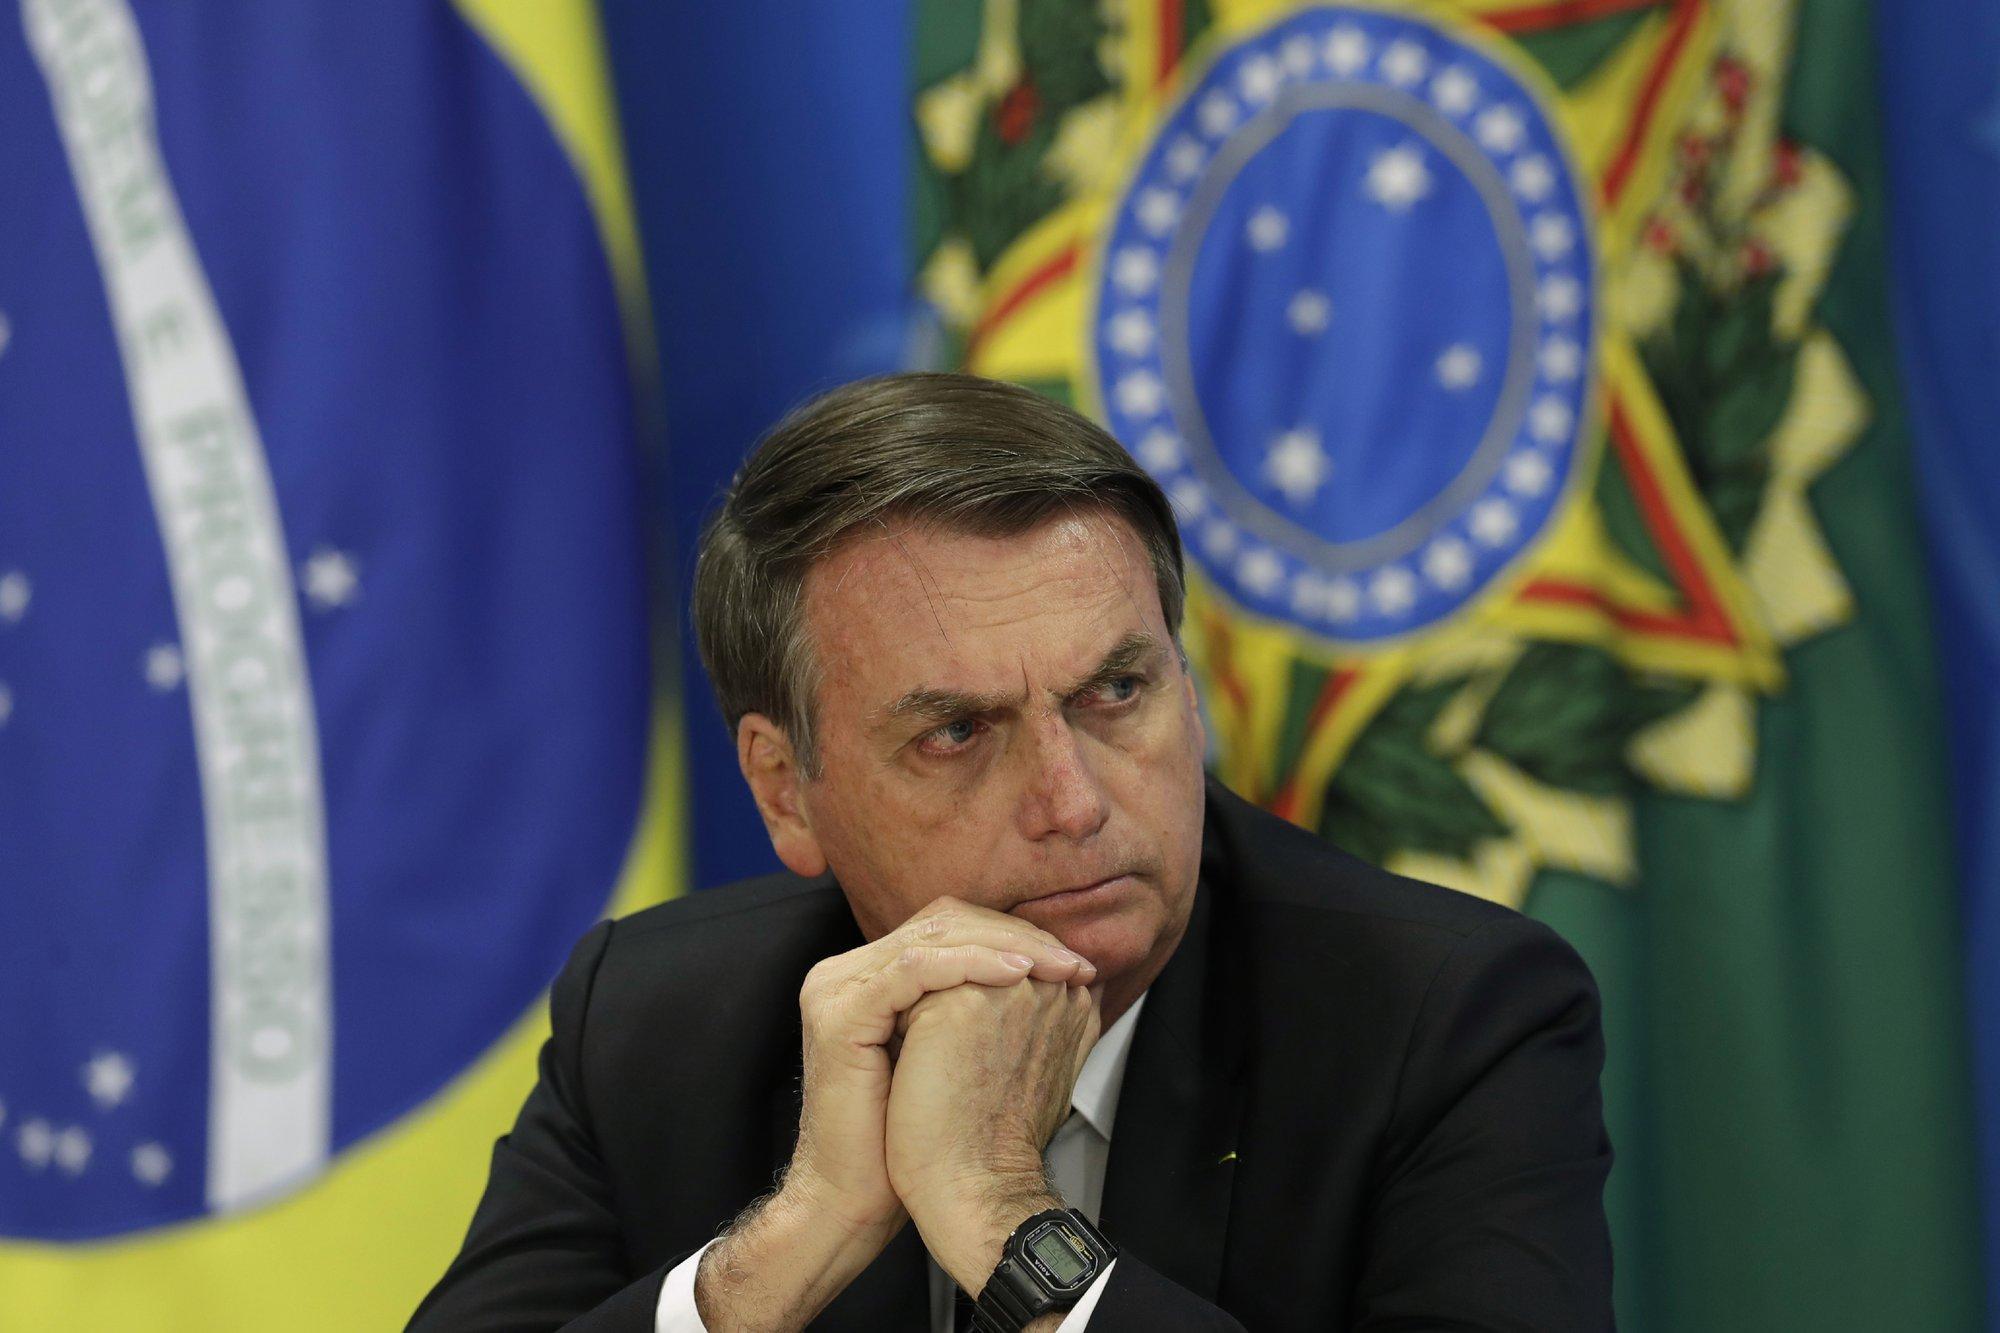 Bolsonaro: Brazil doesn't need Germany's biodiversity funds